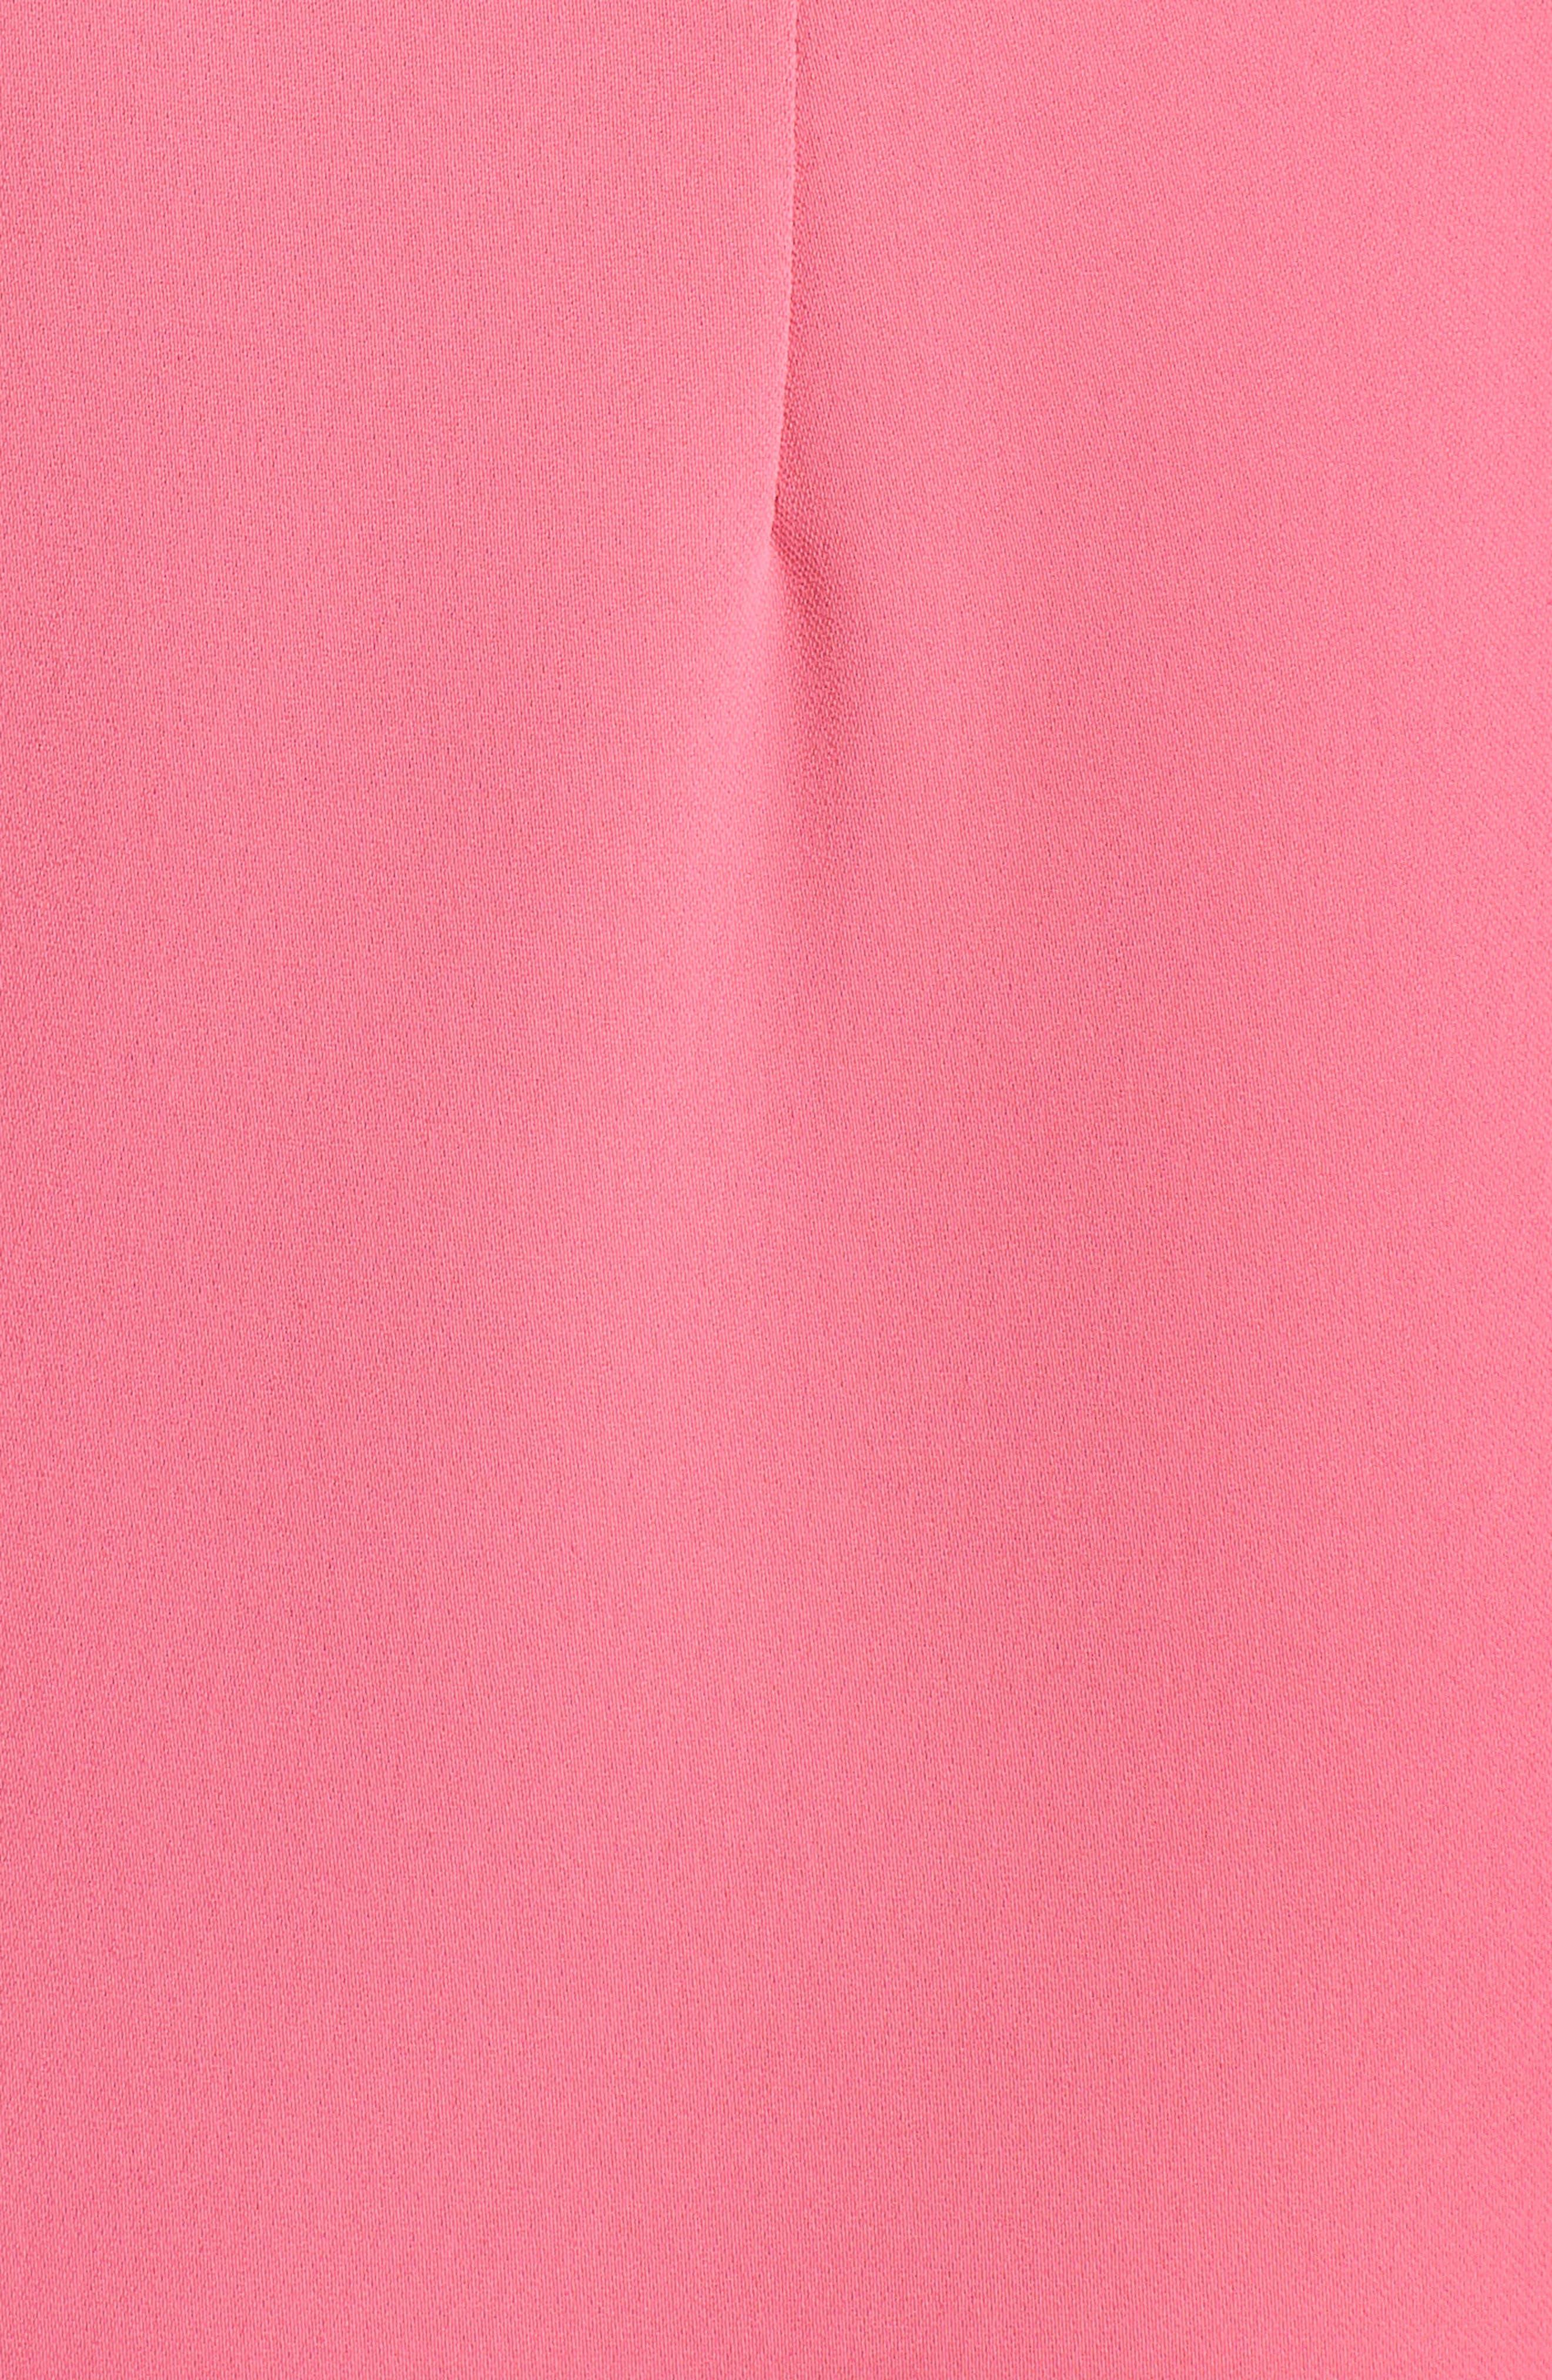 Nera Sheath Dress,                             Alternate thumbnail 5, color,                             Peony